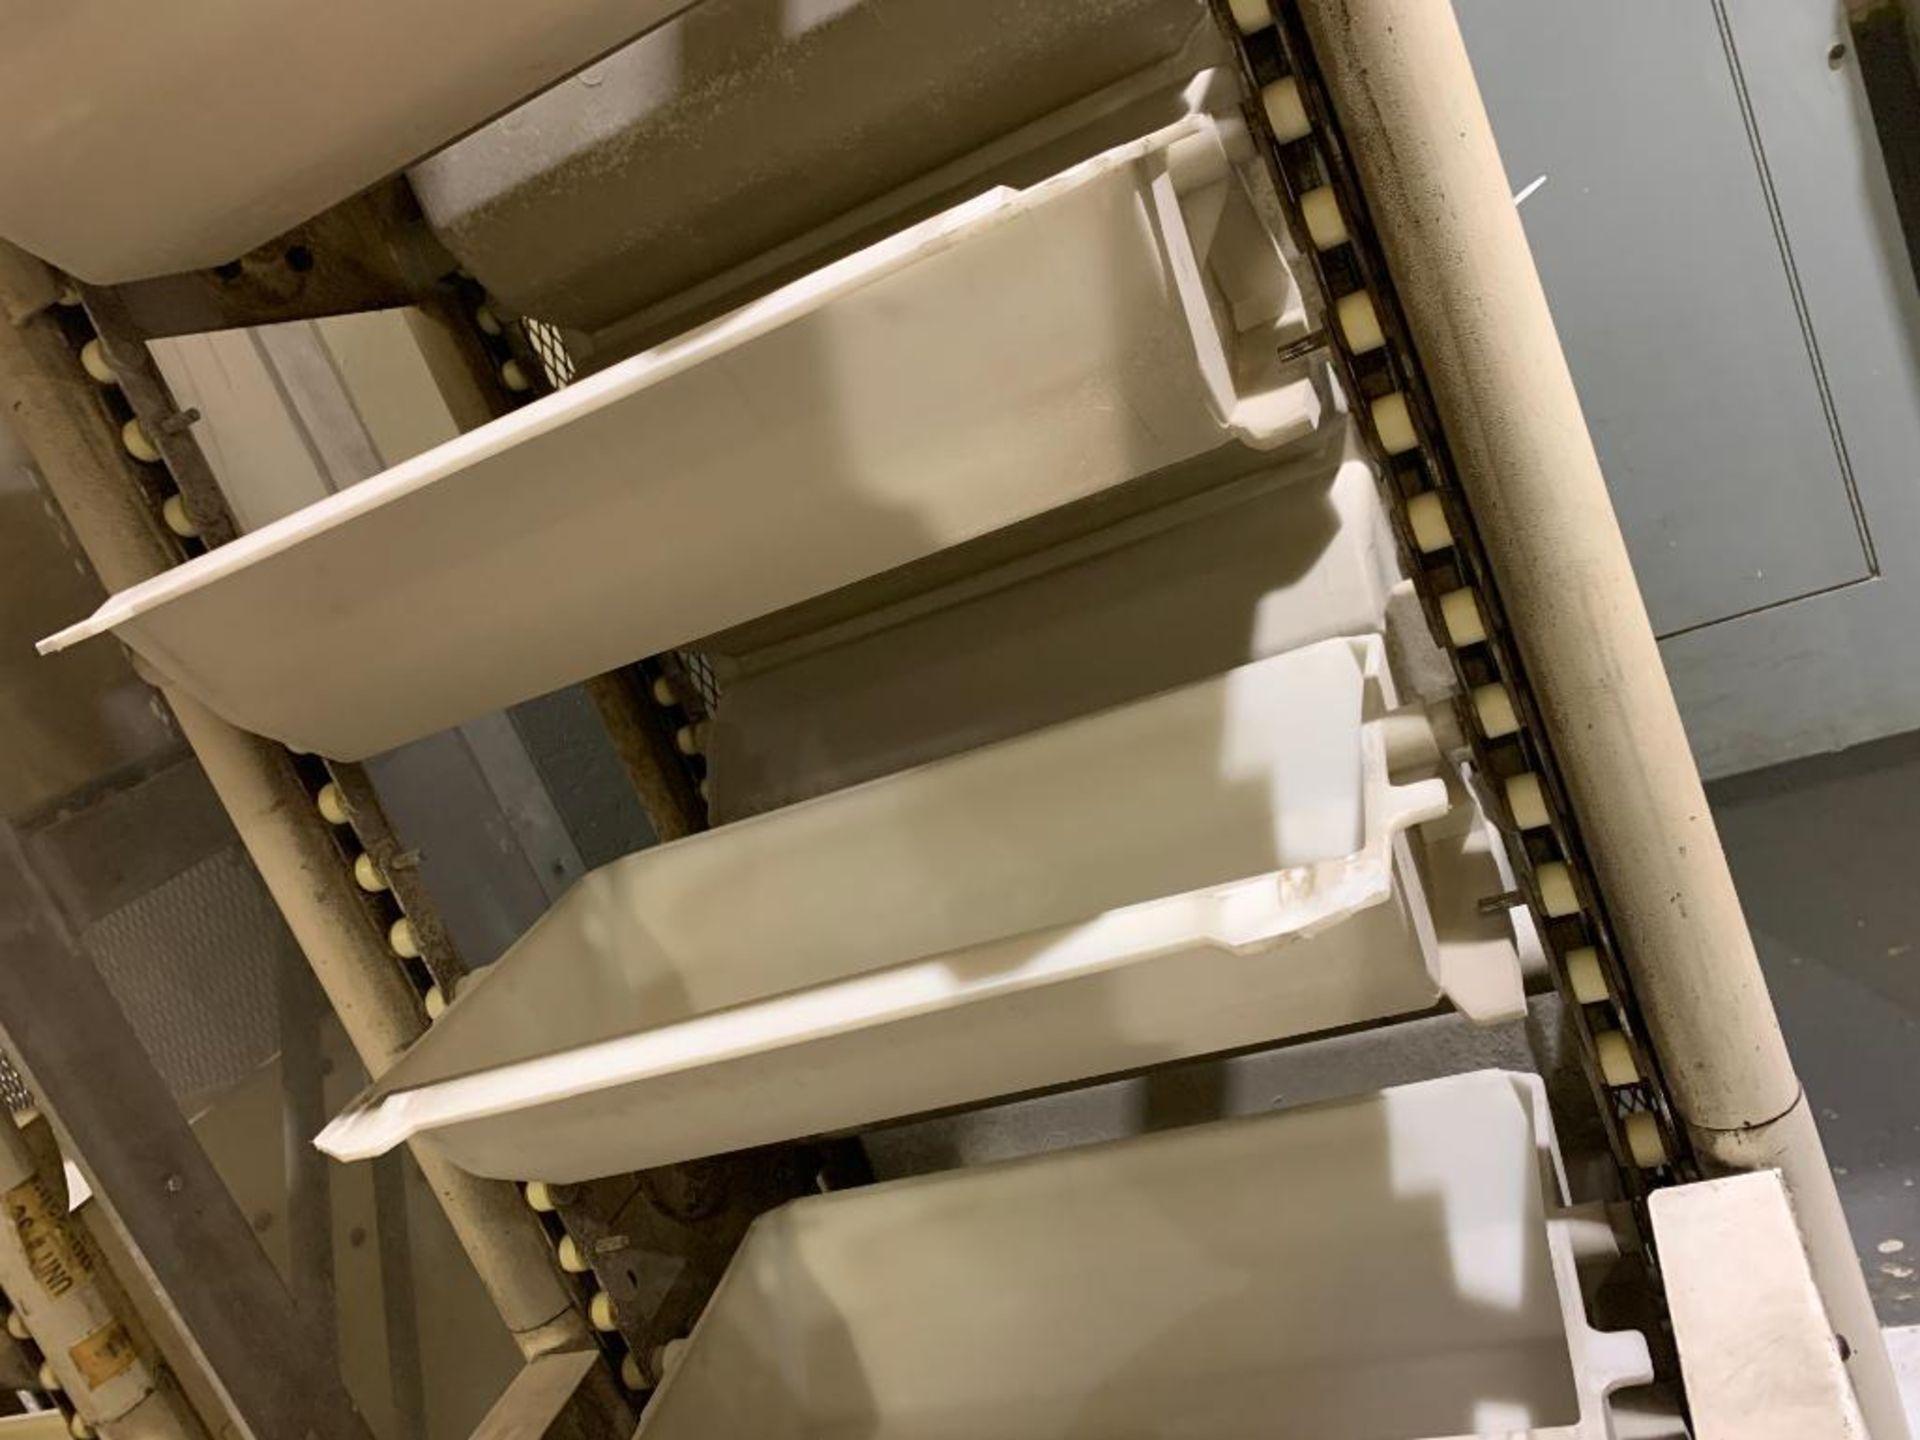 1992 Aseeco horizontal bucket elevator, model ALH-0-24-CP - Image 10 of 18